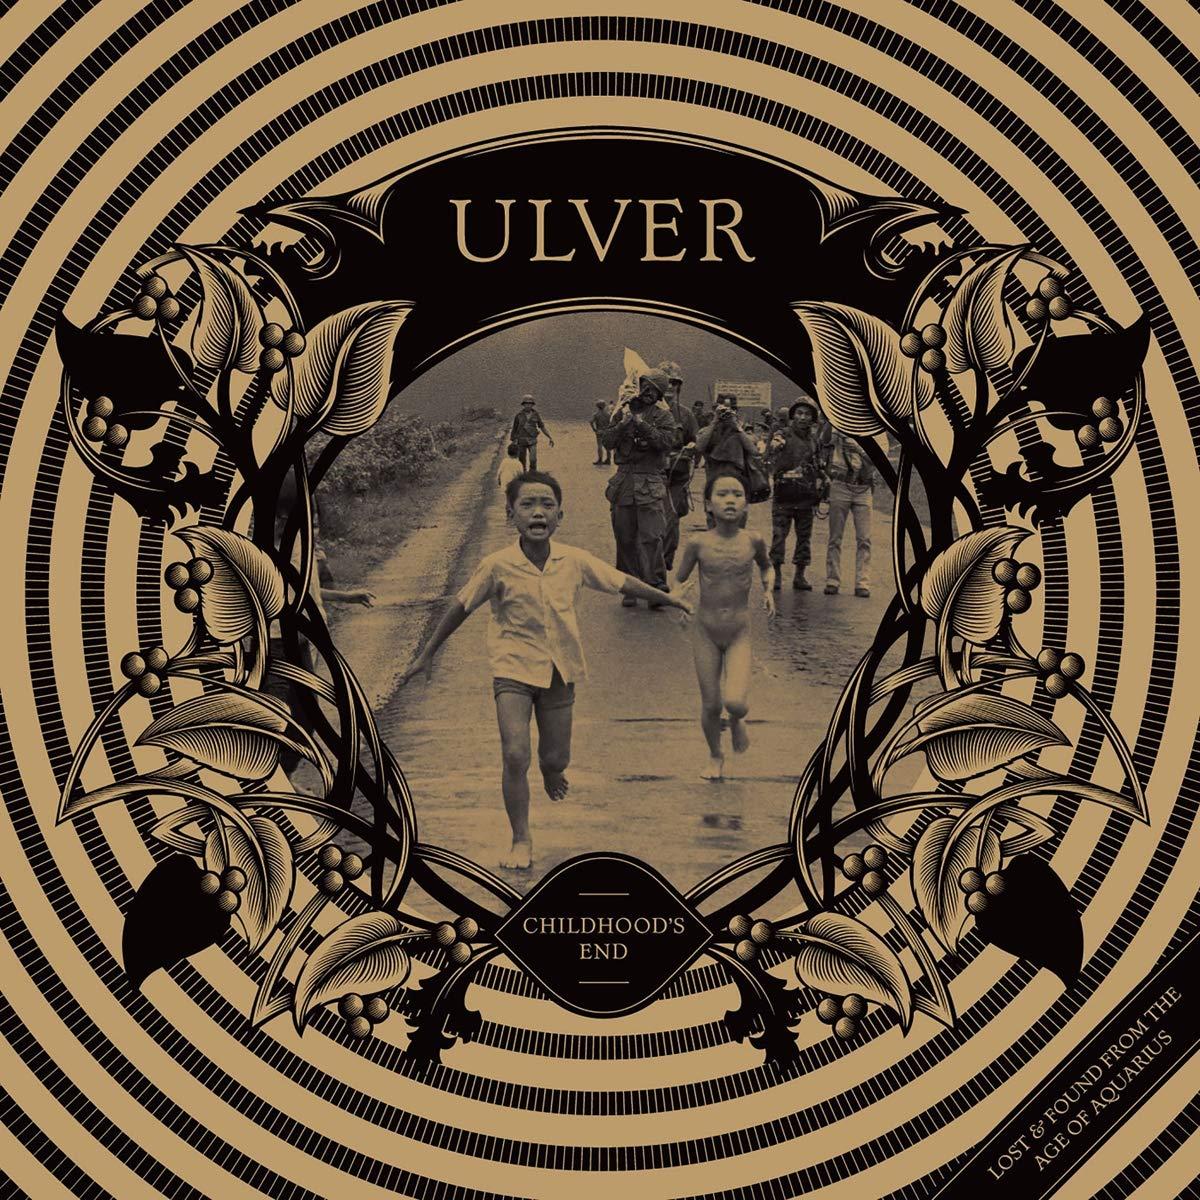 Vinilo : Ulver - Childhood's End (LP Vinyl)